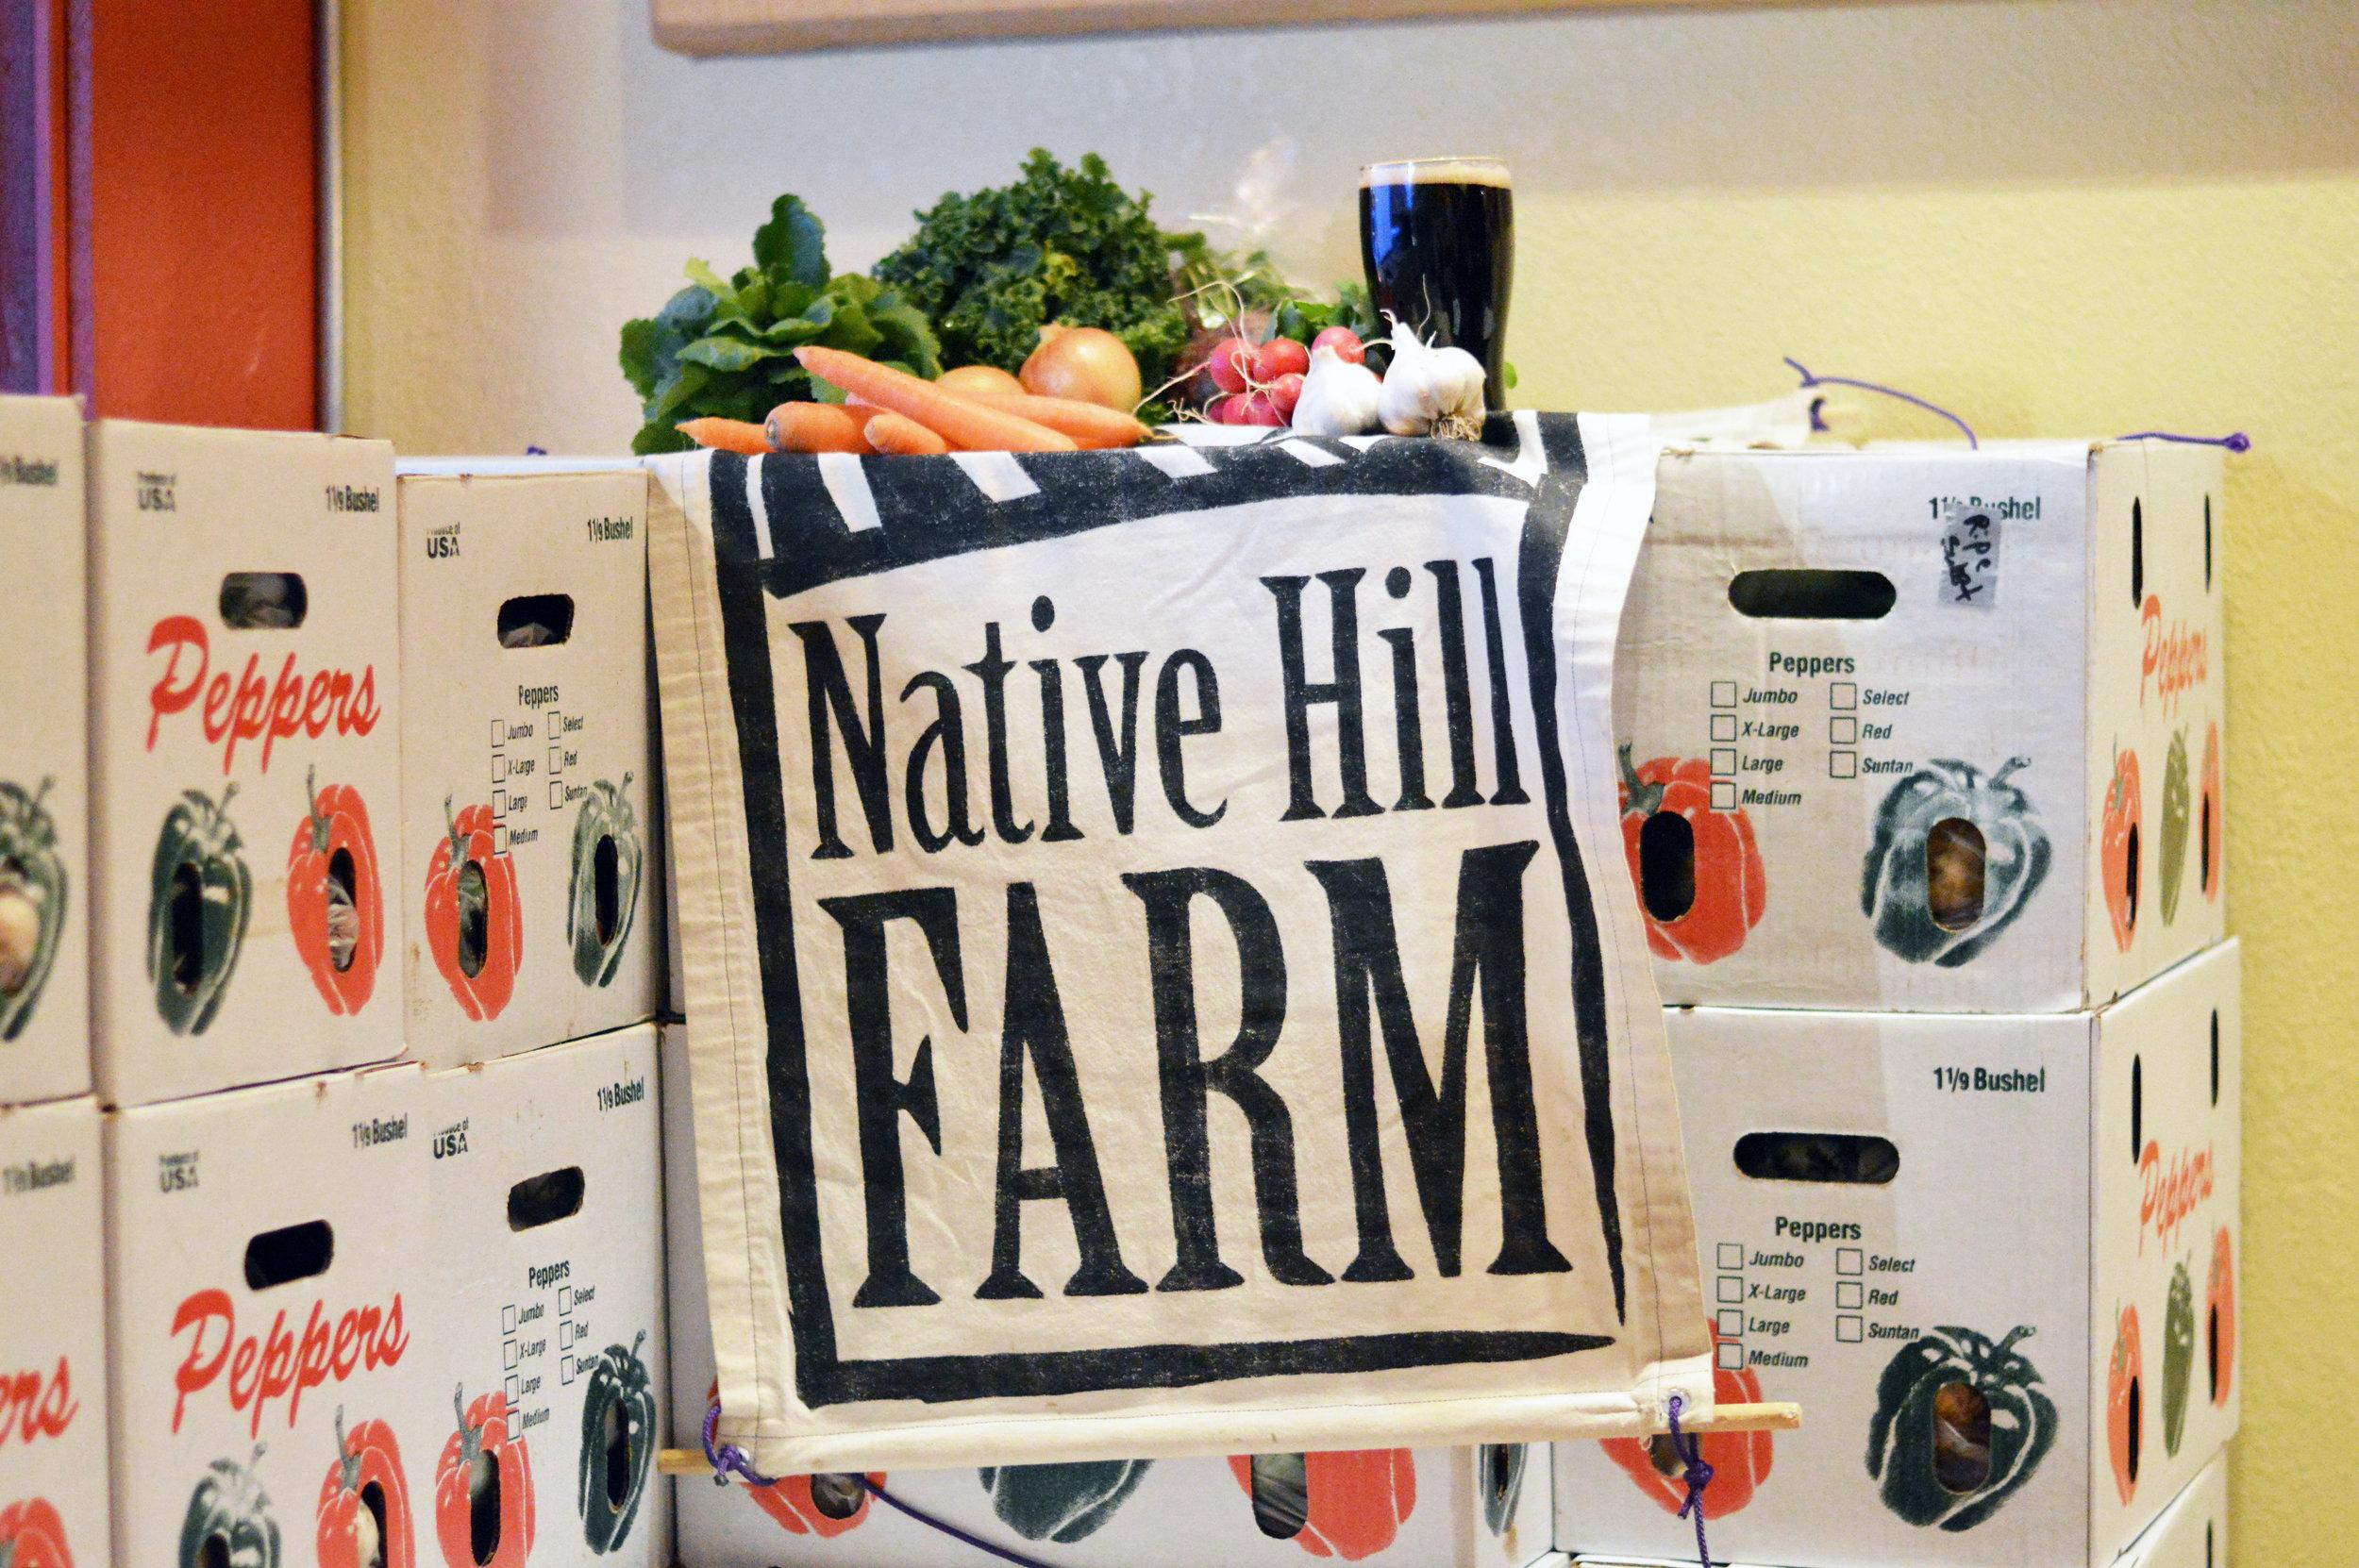 Winter Farm Shares now on sale!